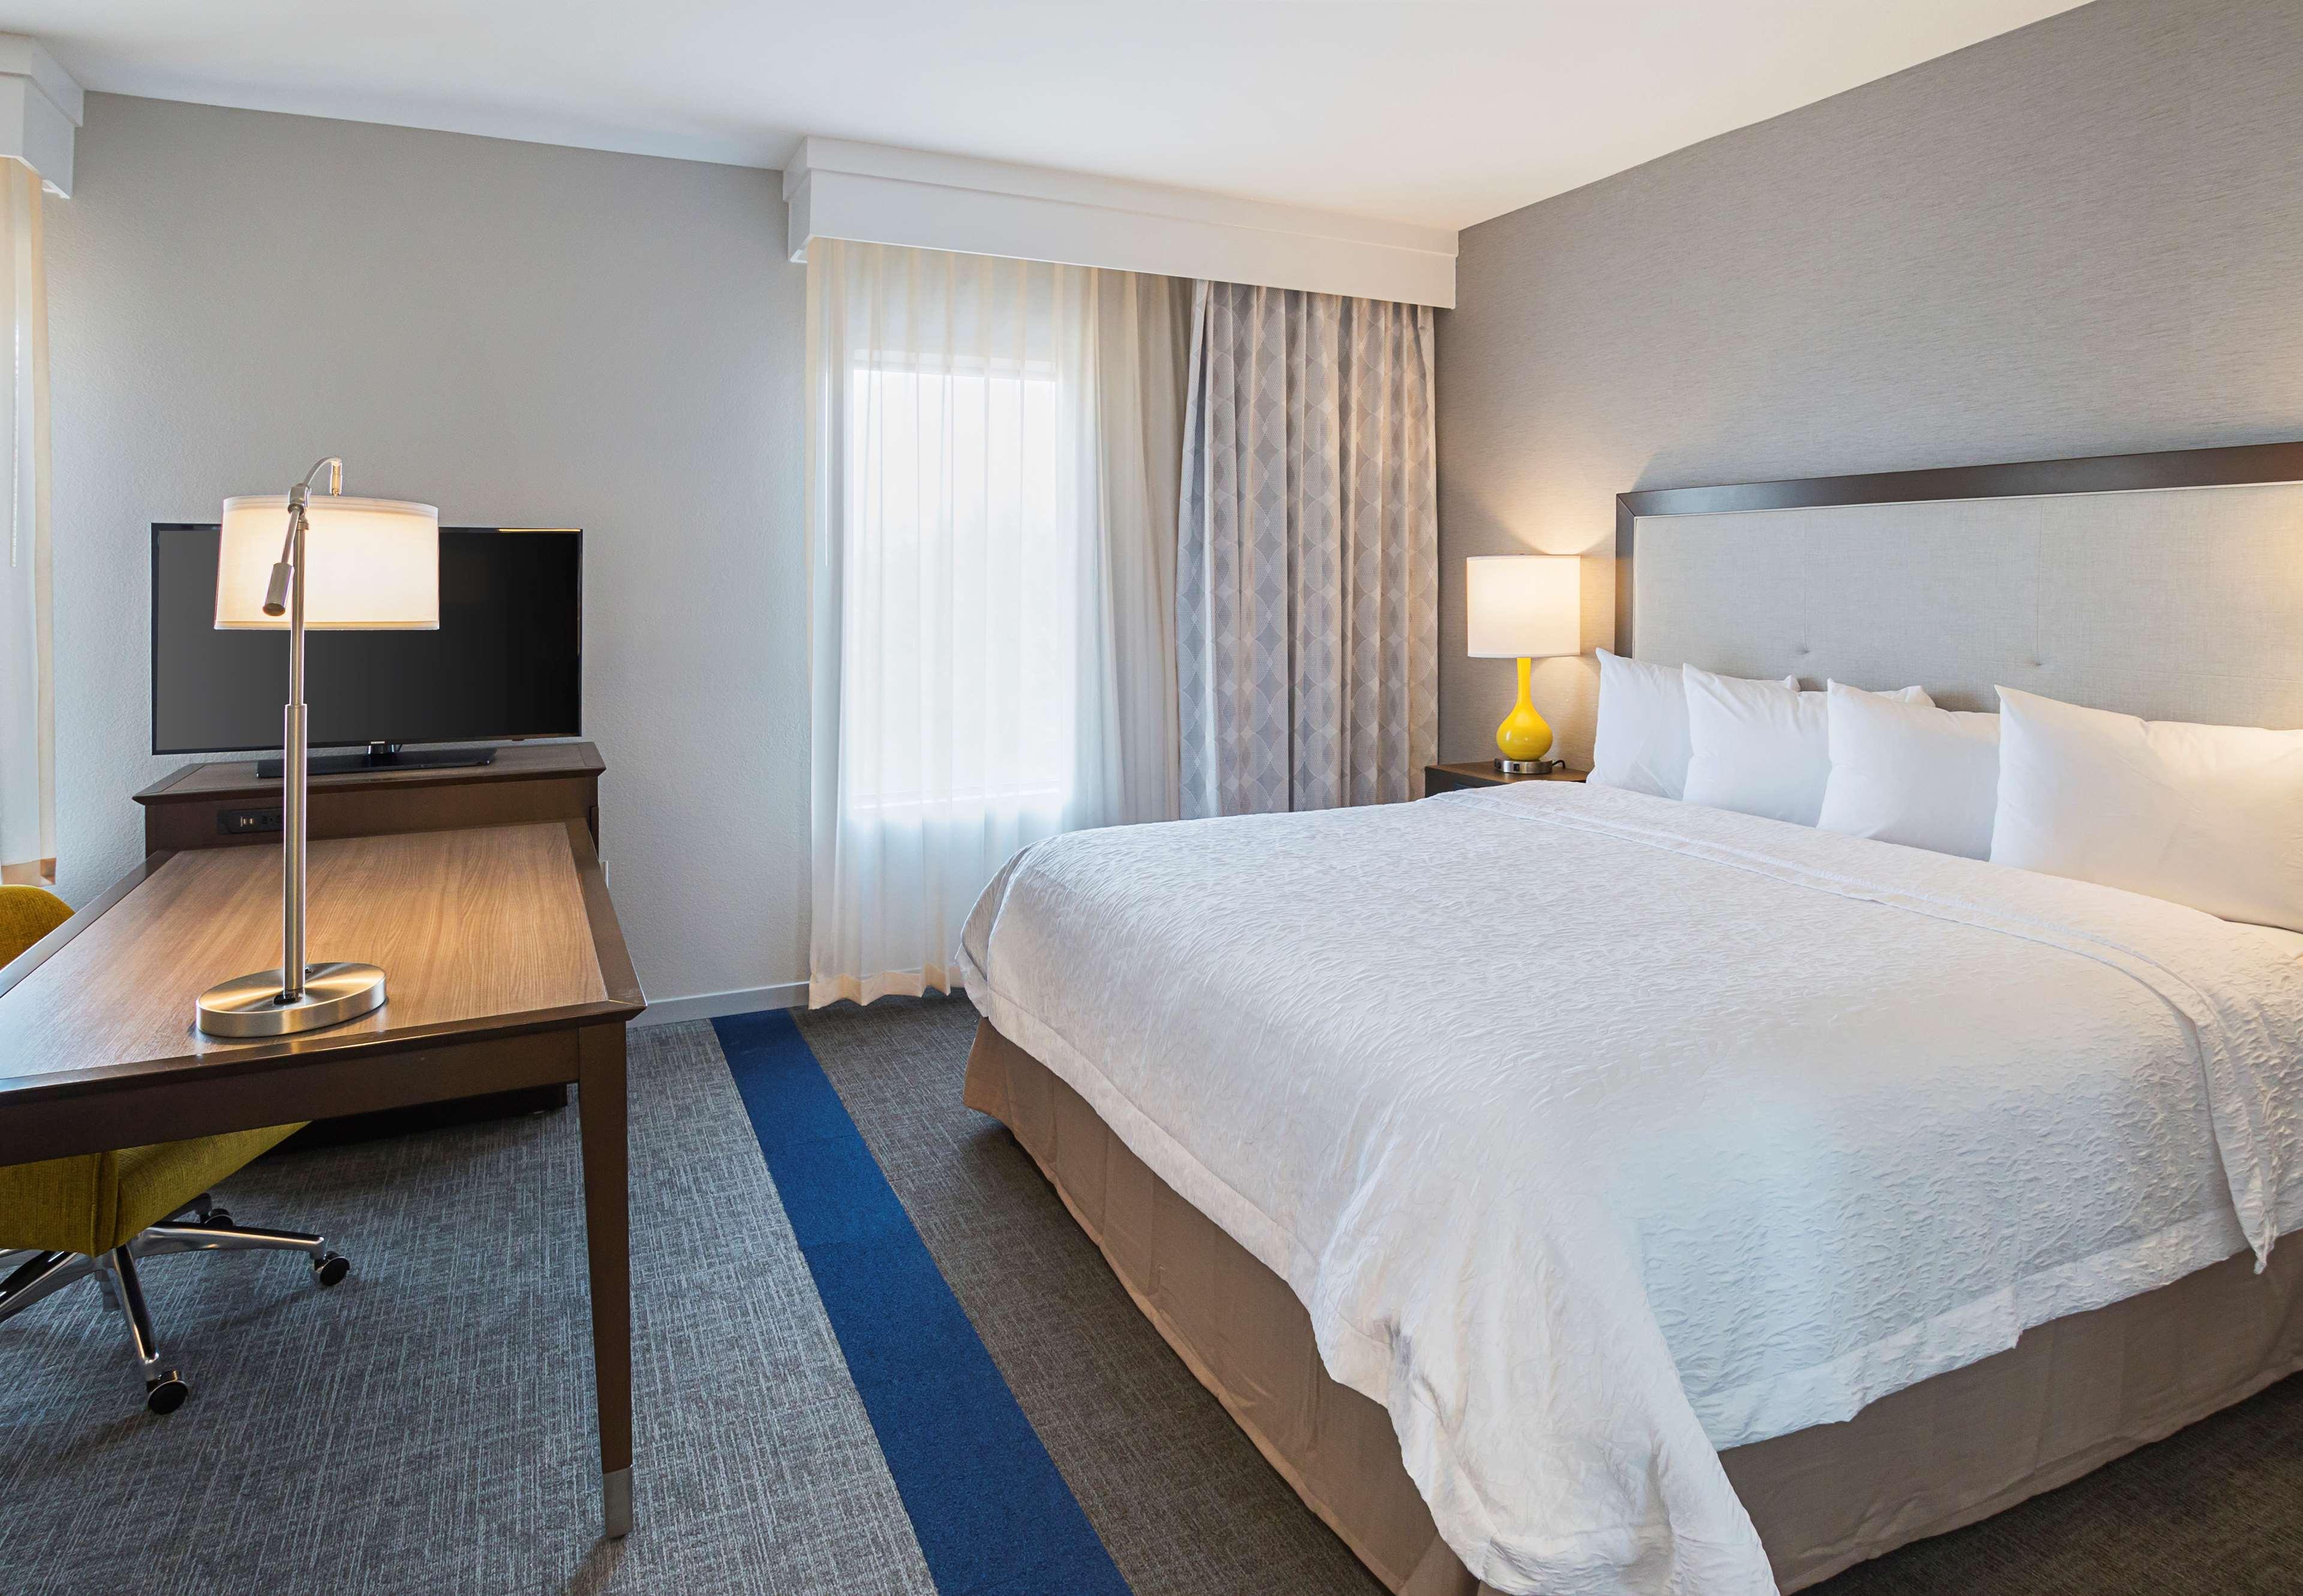 Hampton Inn & Suites Colleyville DFW West image 34